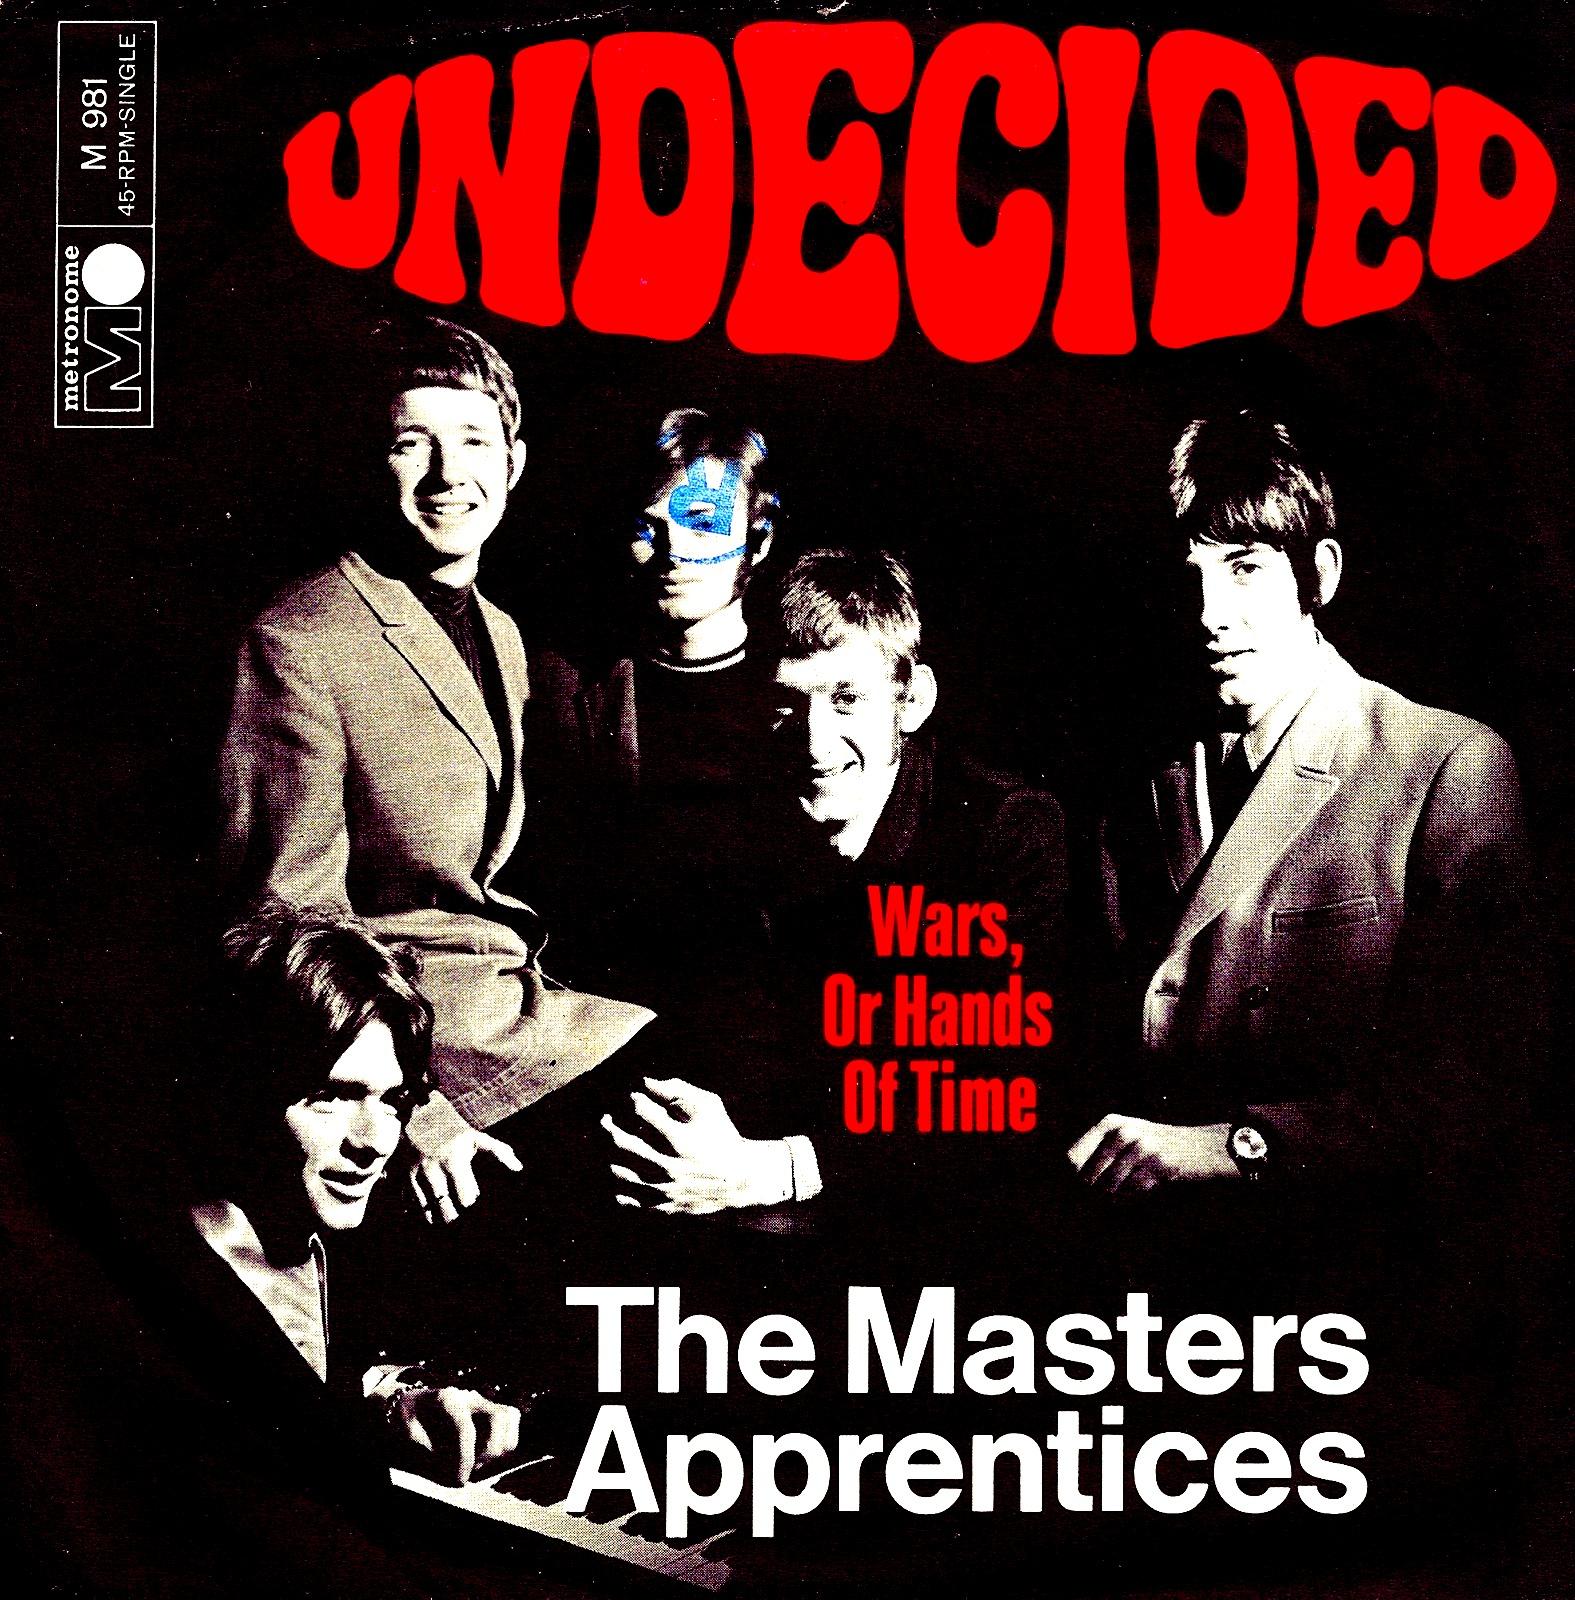 Jim Keays - Undecided